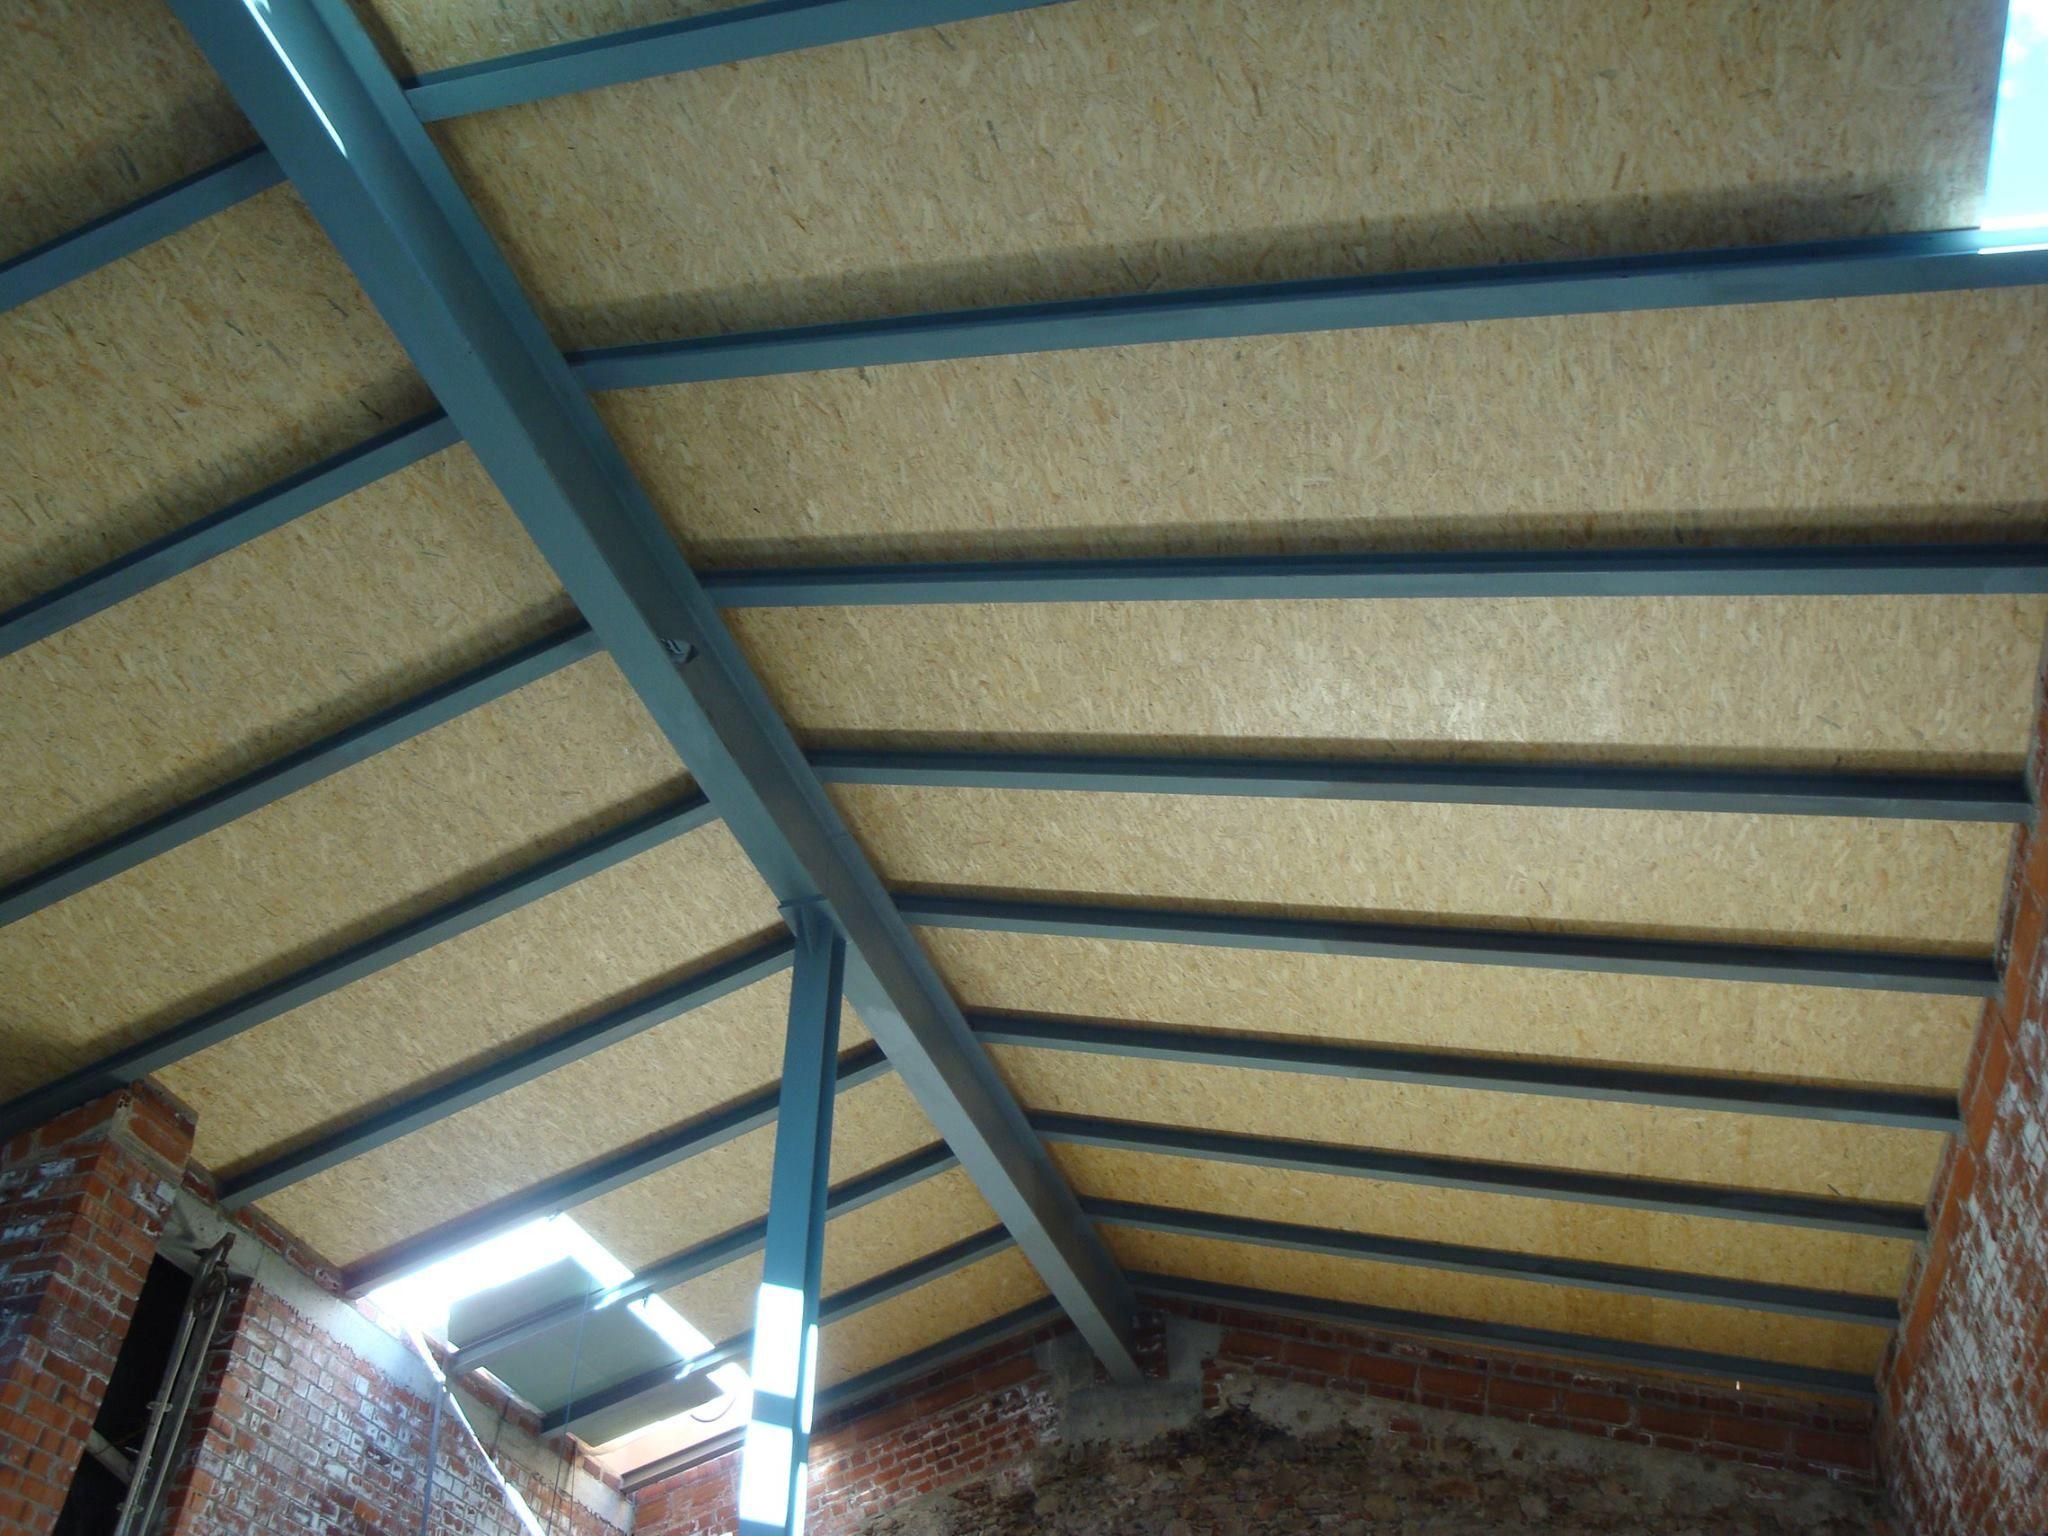 Cubiertas a dos aguas hechas con paneles s ndwich - Cubiertas para techos ...